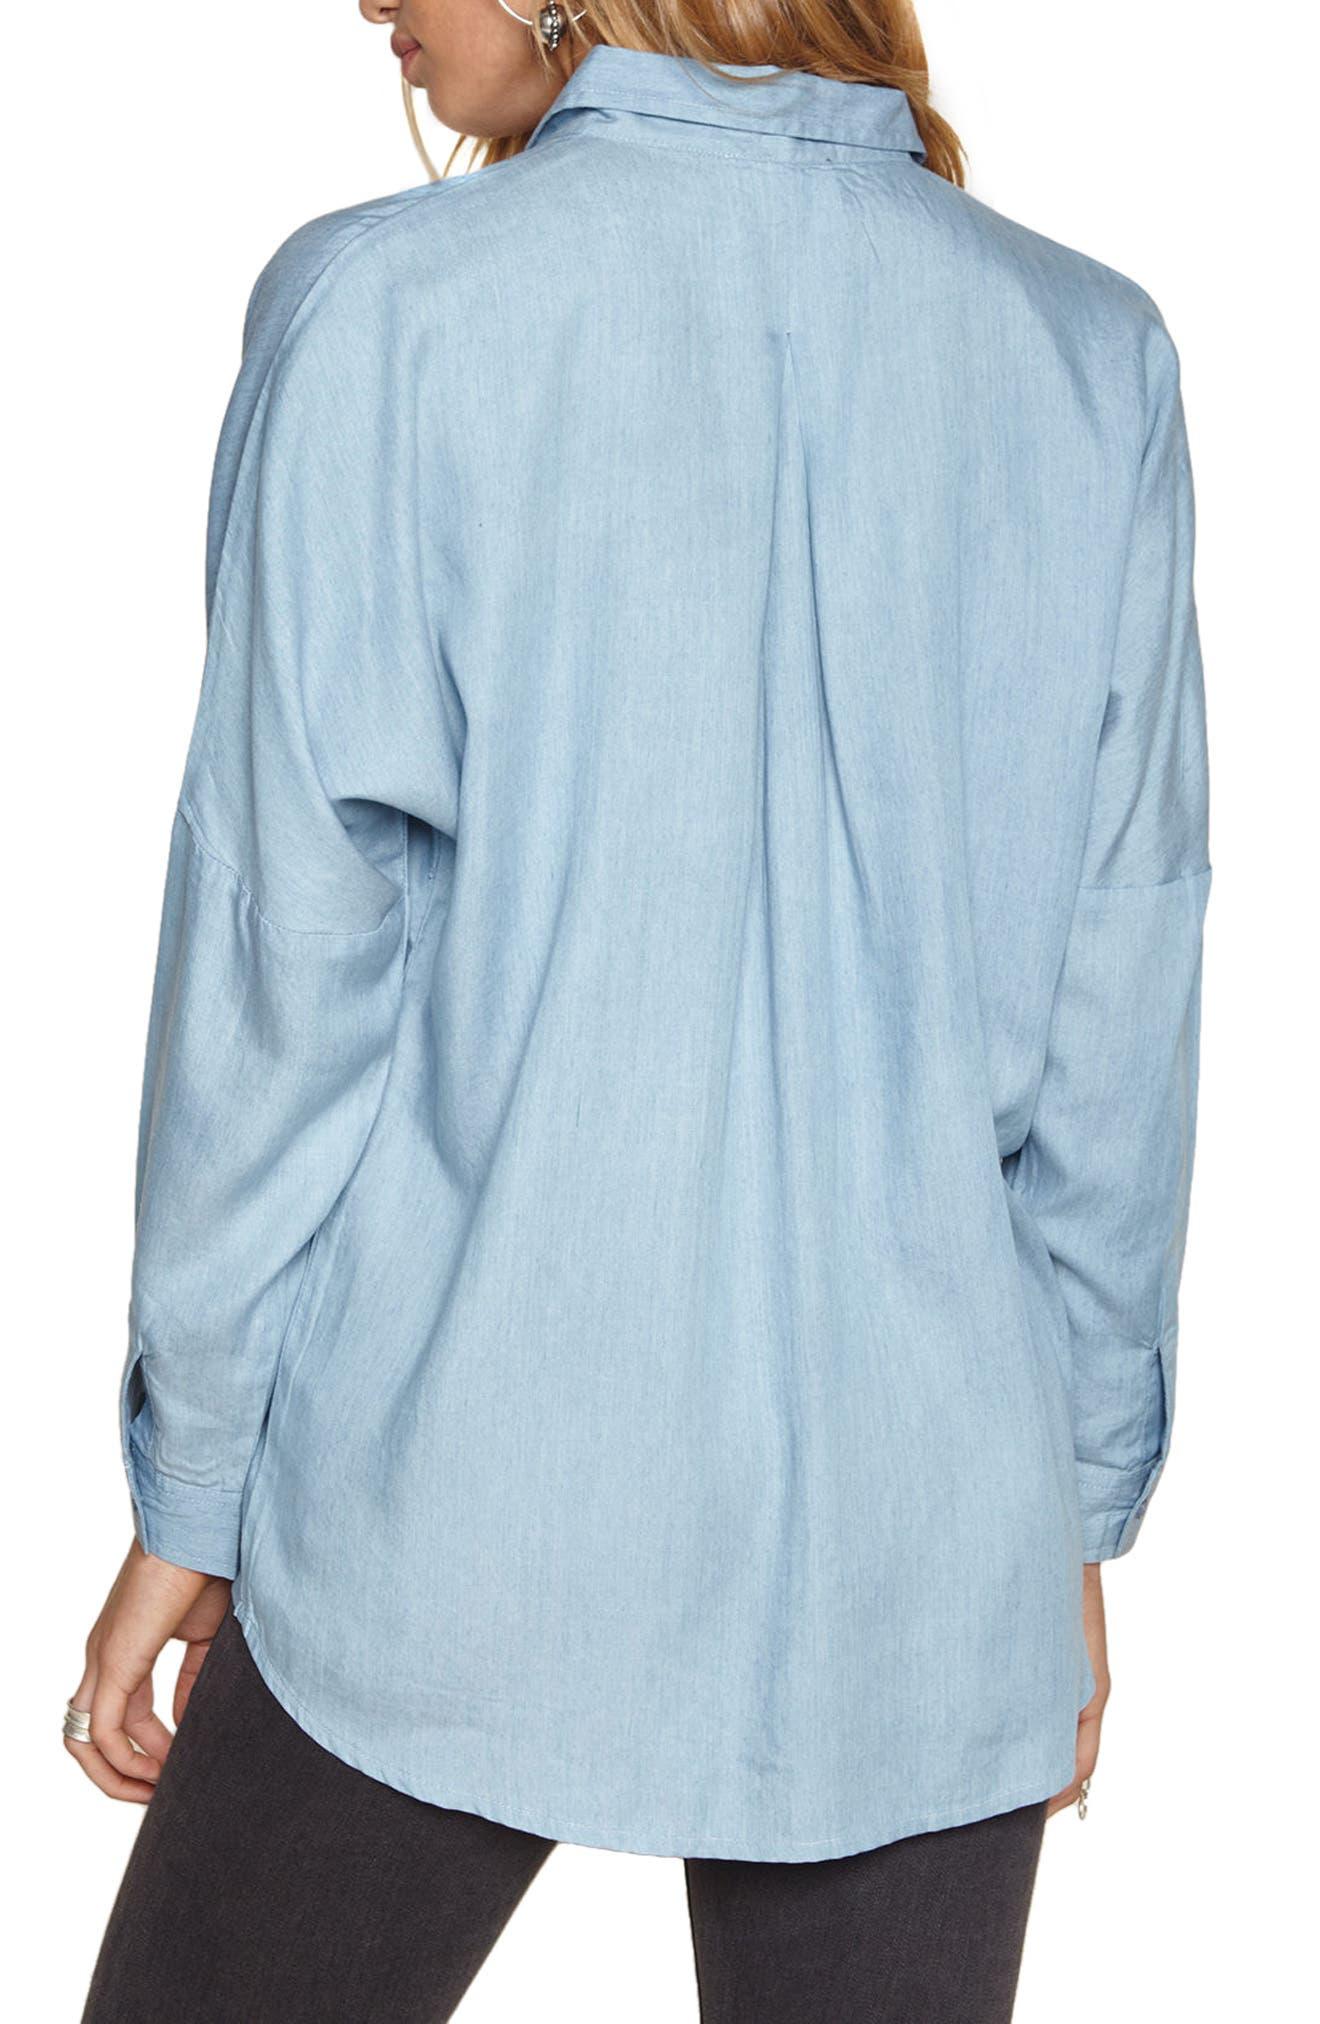 Casual Fridays Chambray Shirt,                             Alternate thumbnail 3, color,                             Blue Vintage